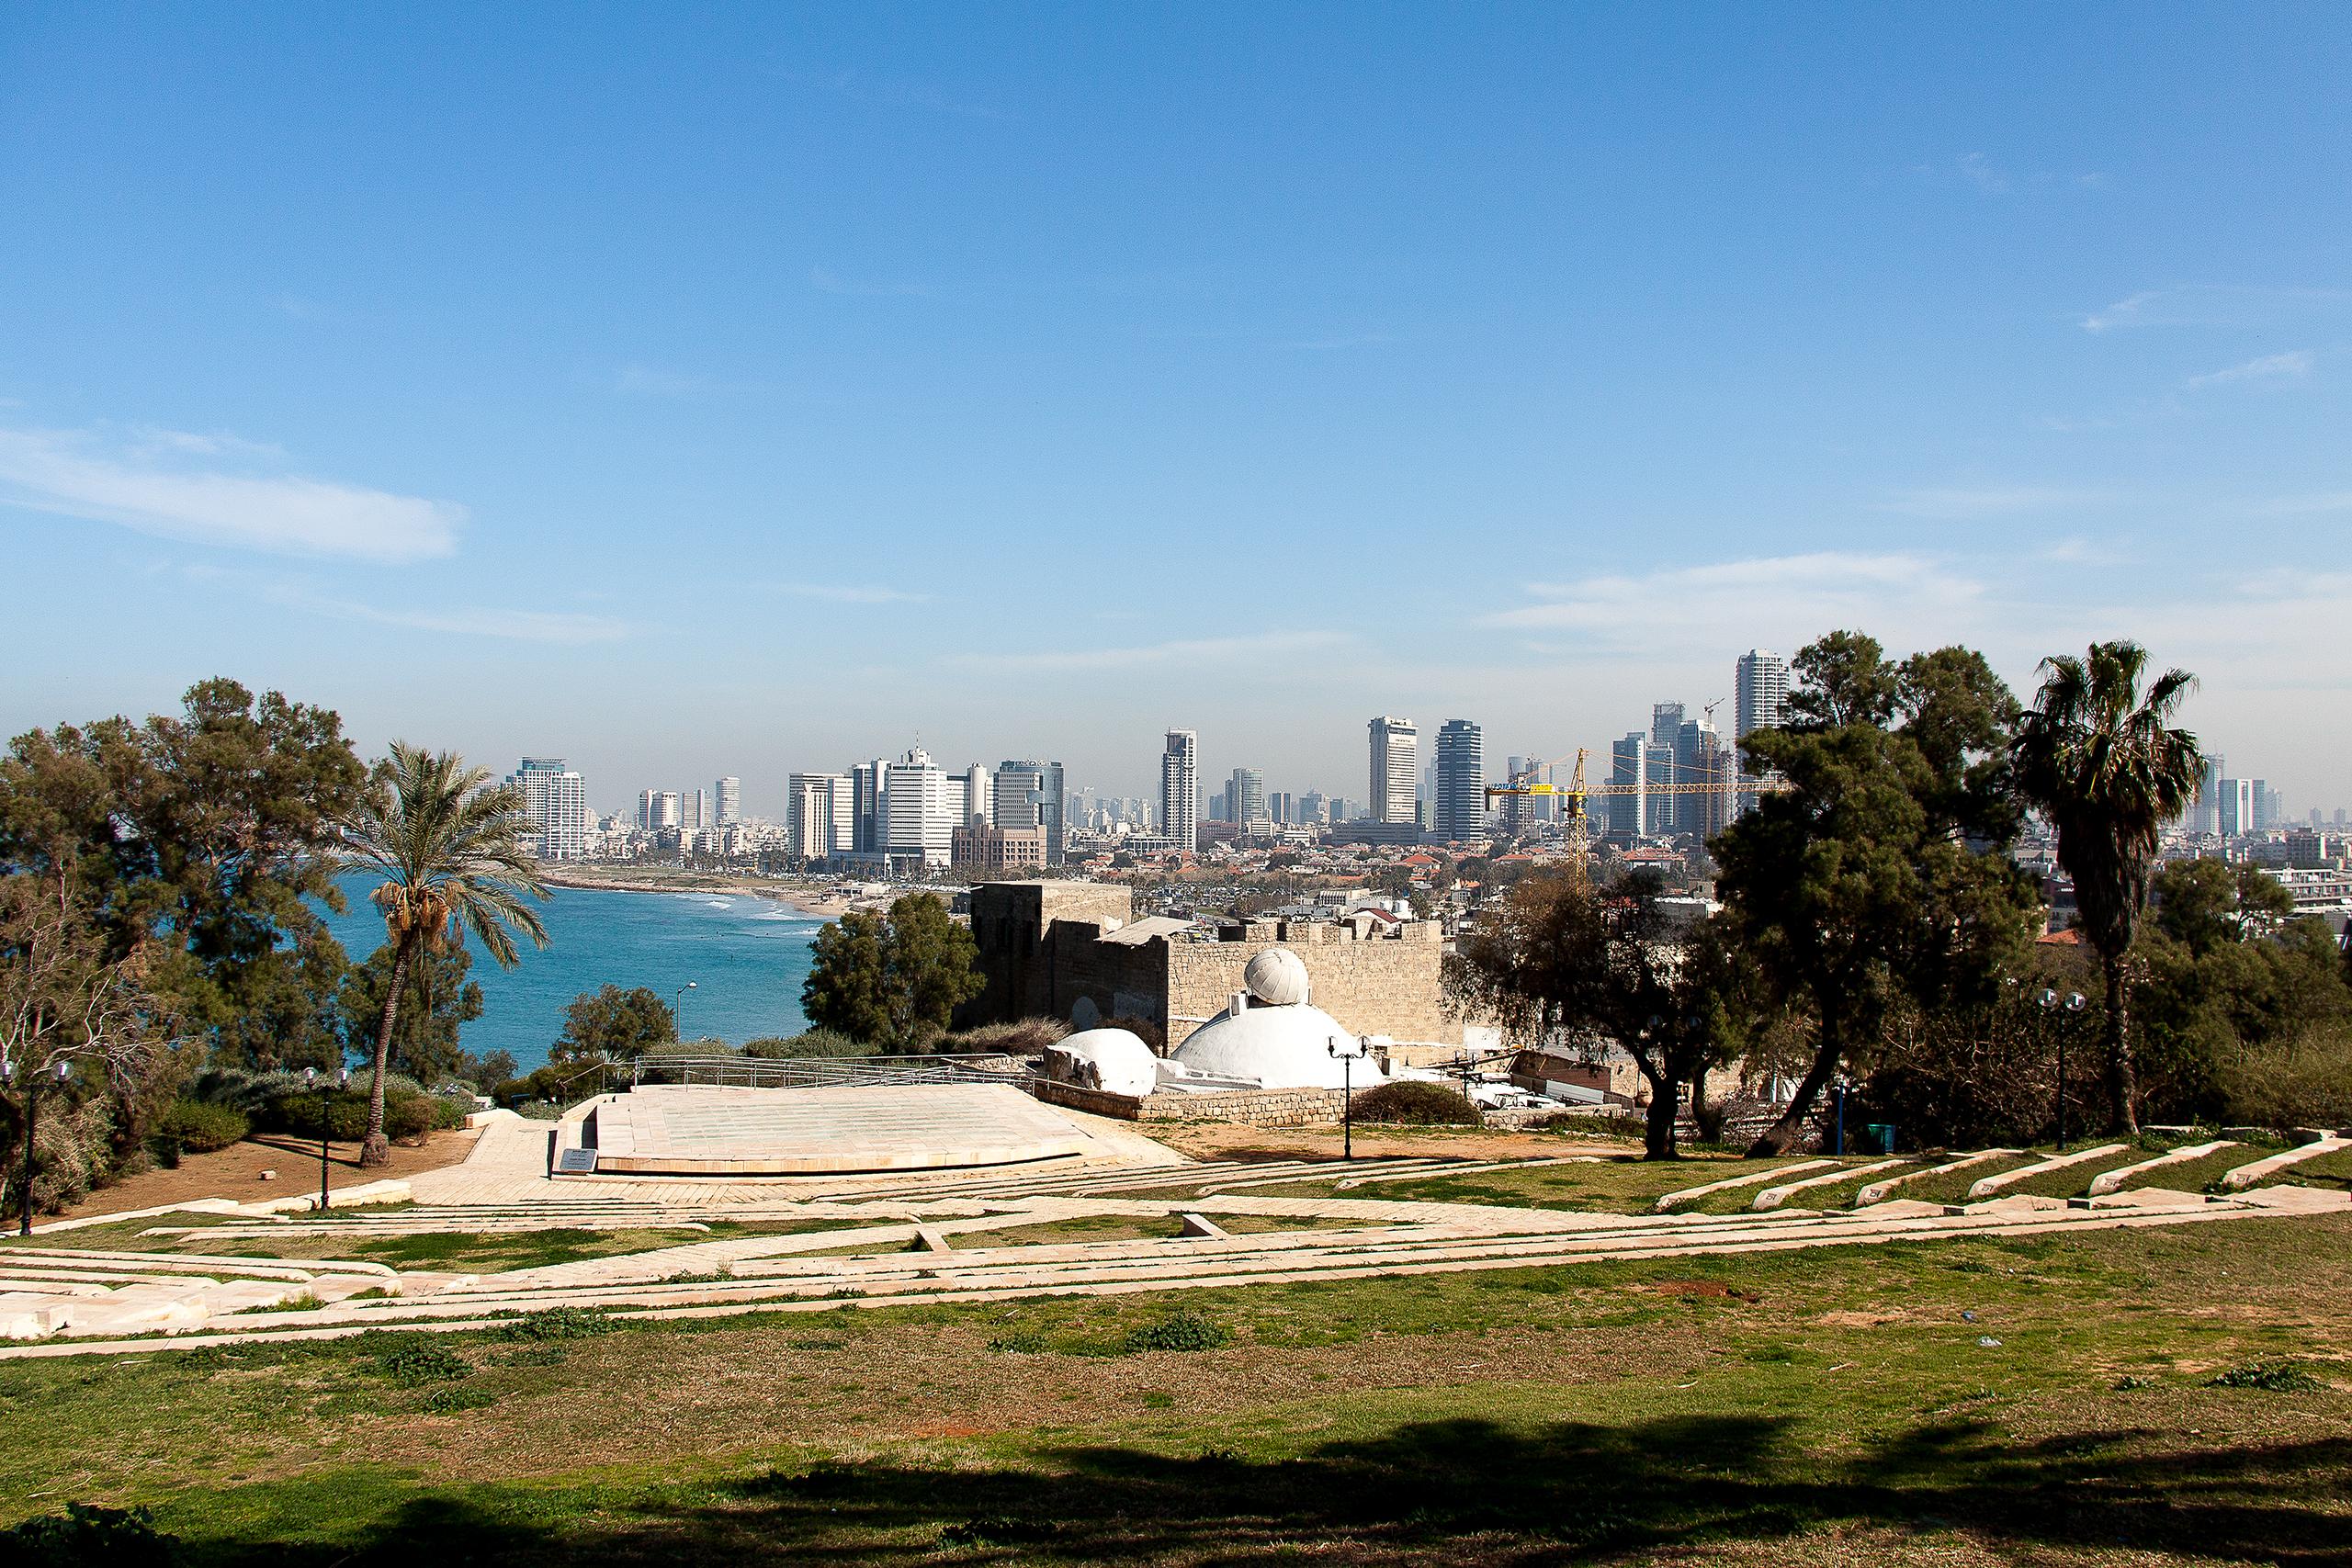 Israel - Tel Aviv-Yafo